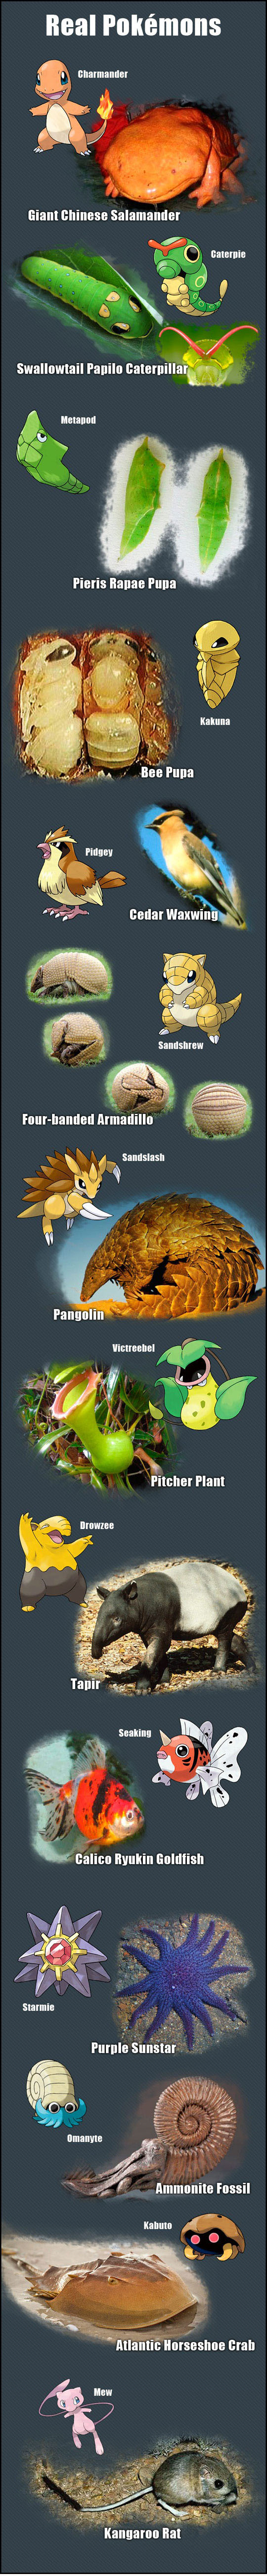 Real world Pokemon